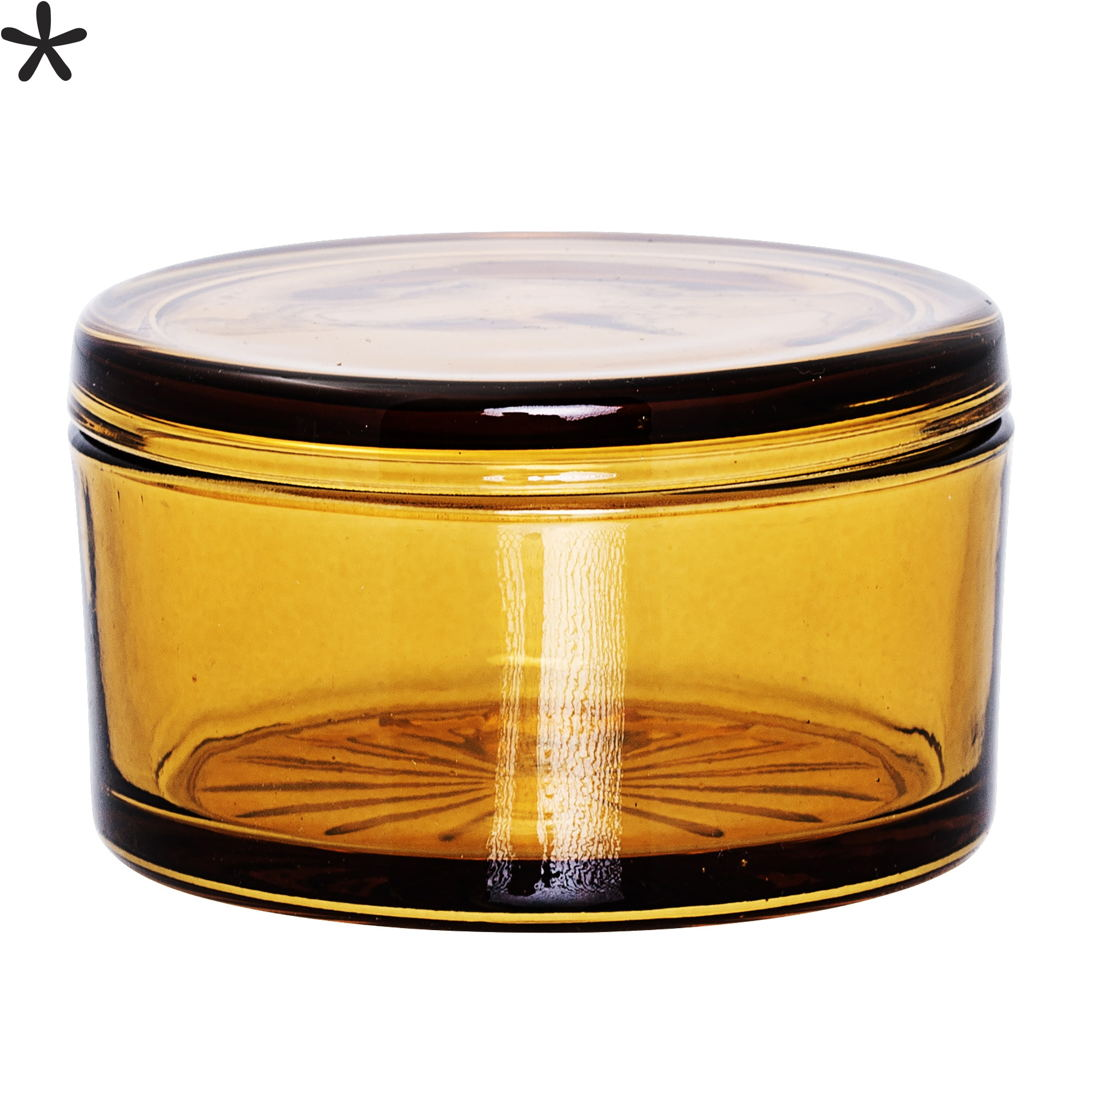 Bloomingville Voorraadpot met deksel amber 16€